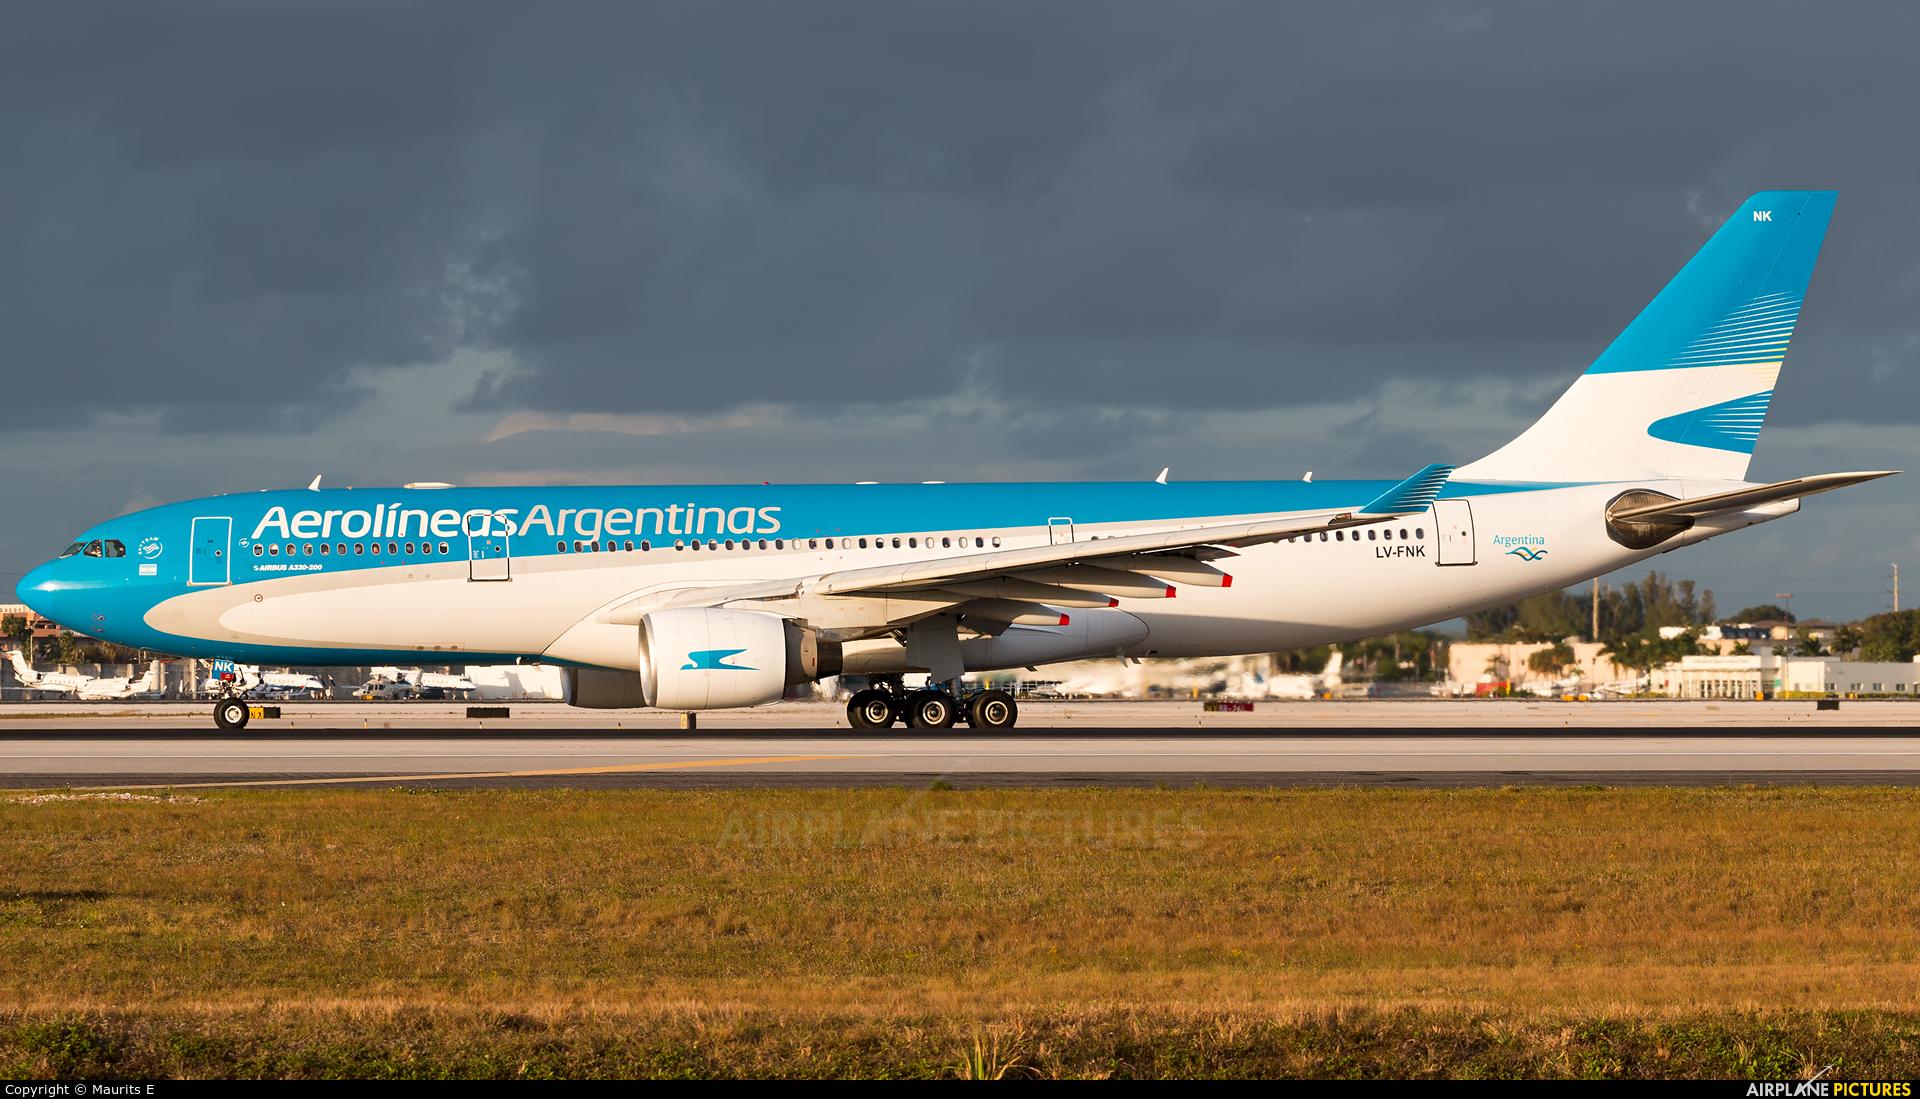 Aerolineas Argentinas LV-FNK aircraft at Miami Intl